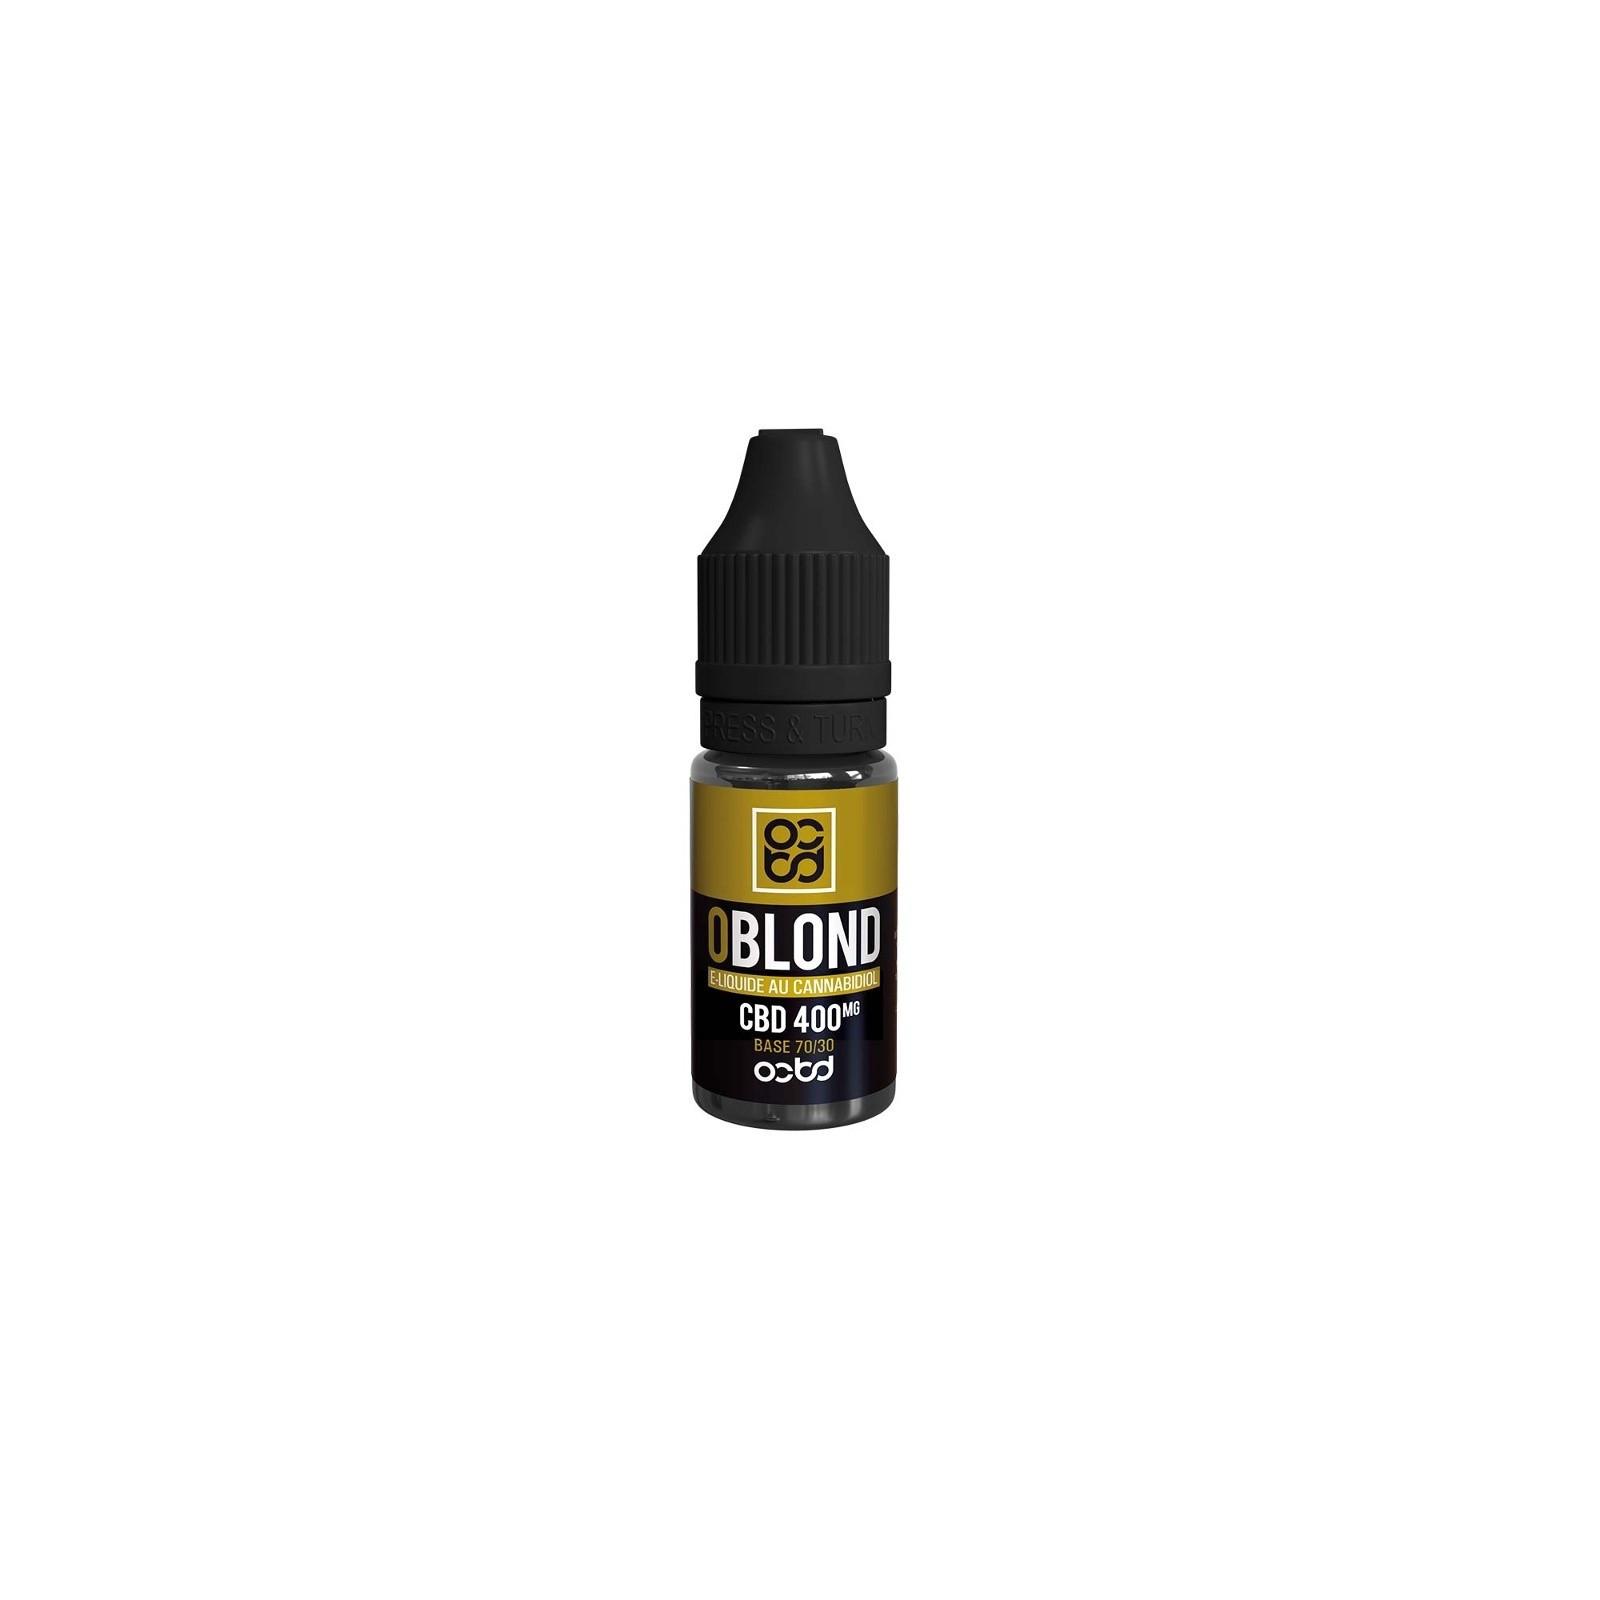 Oblond - Hemptech